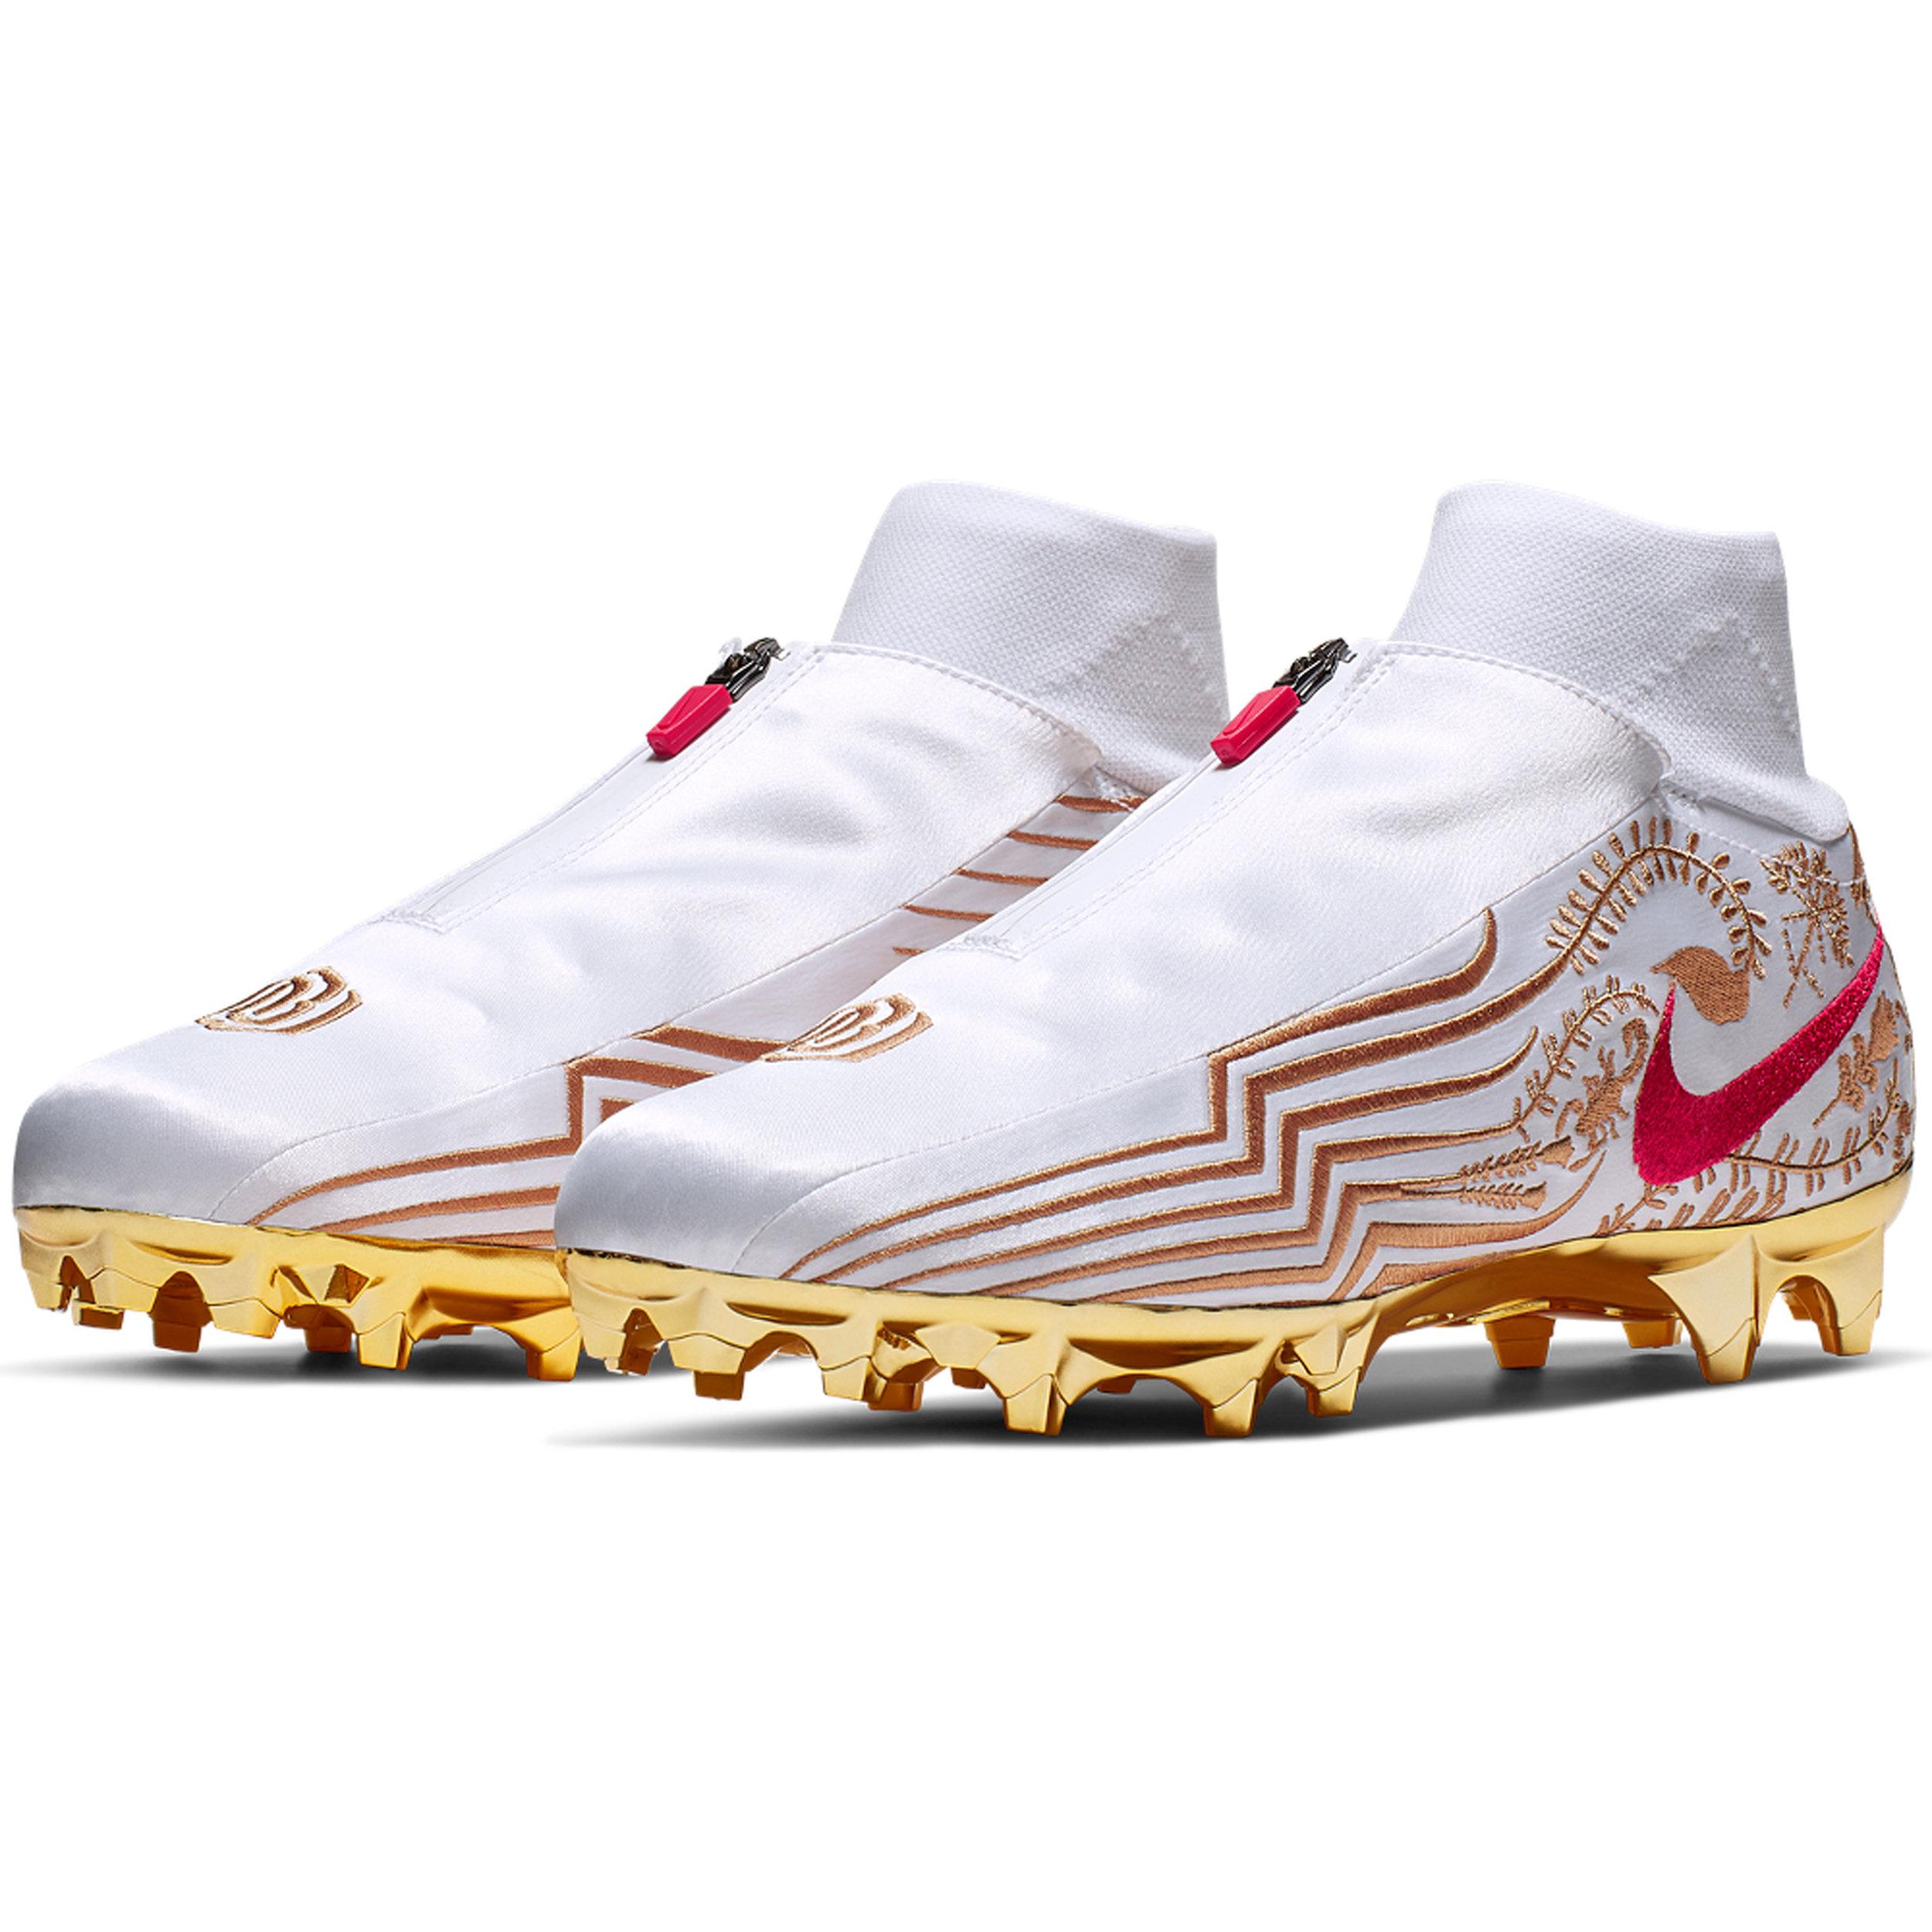 NikeNews_NikeVaporUntouchablePro3_OBJ_02_89292.jpg